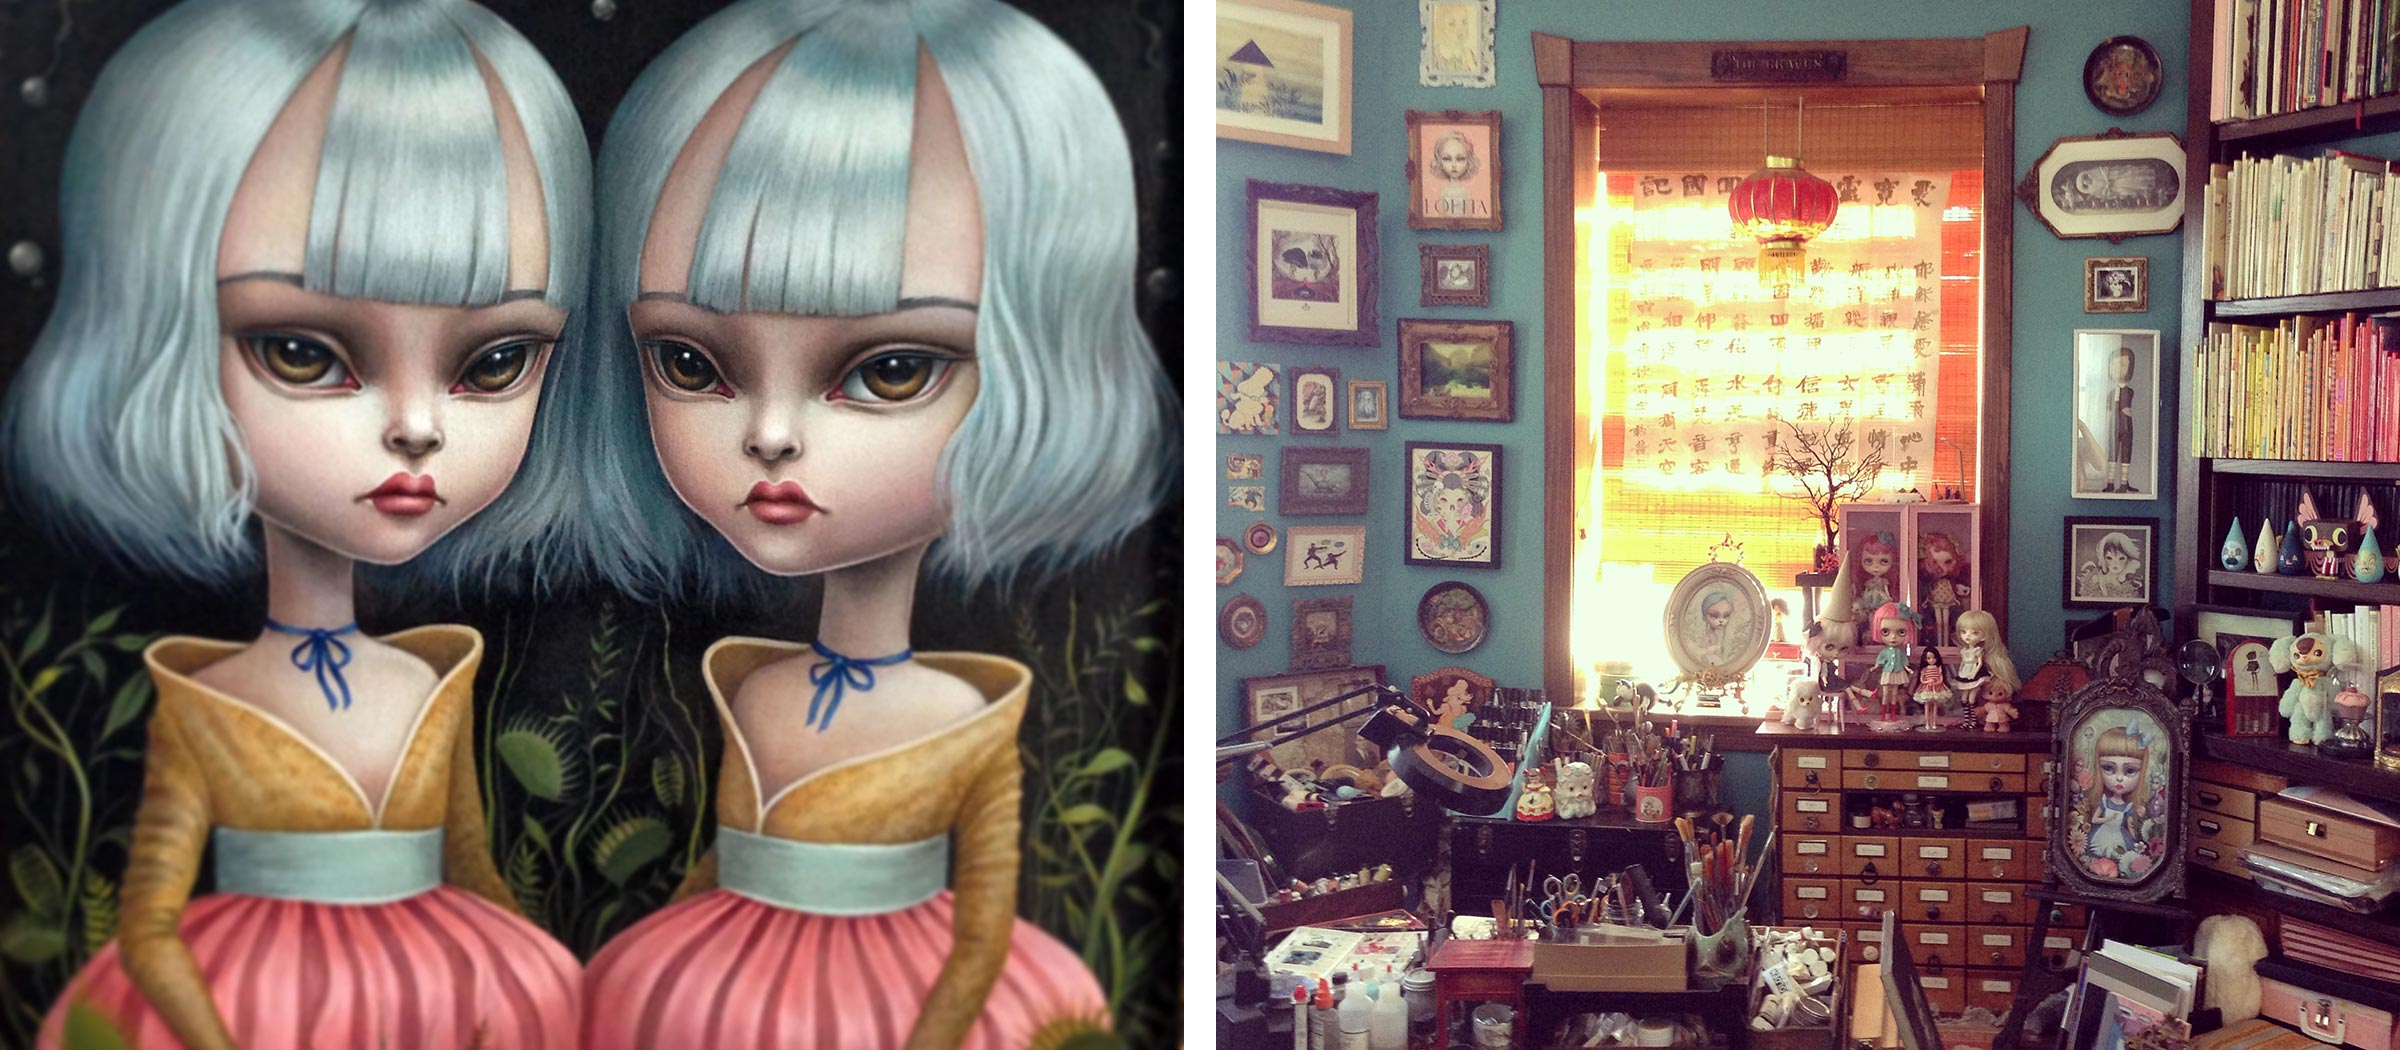 Pivot-Blog-Mab-Graves-Alice-In-Wonderland-Collage-01